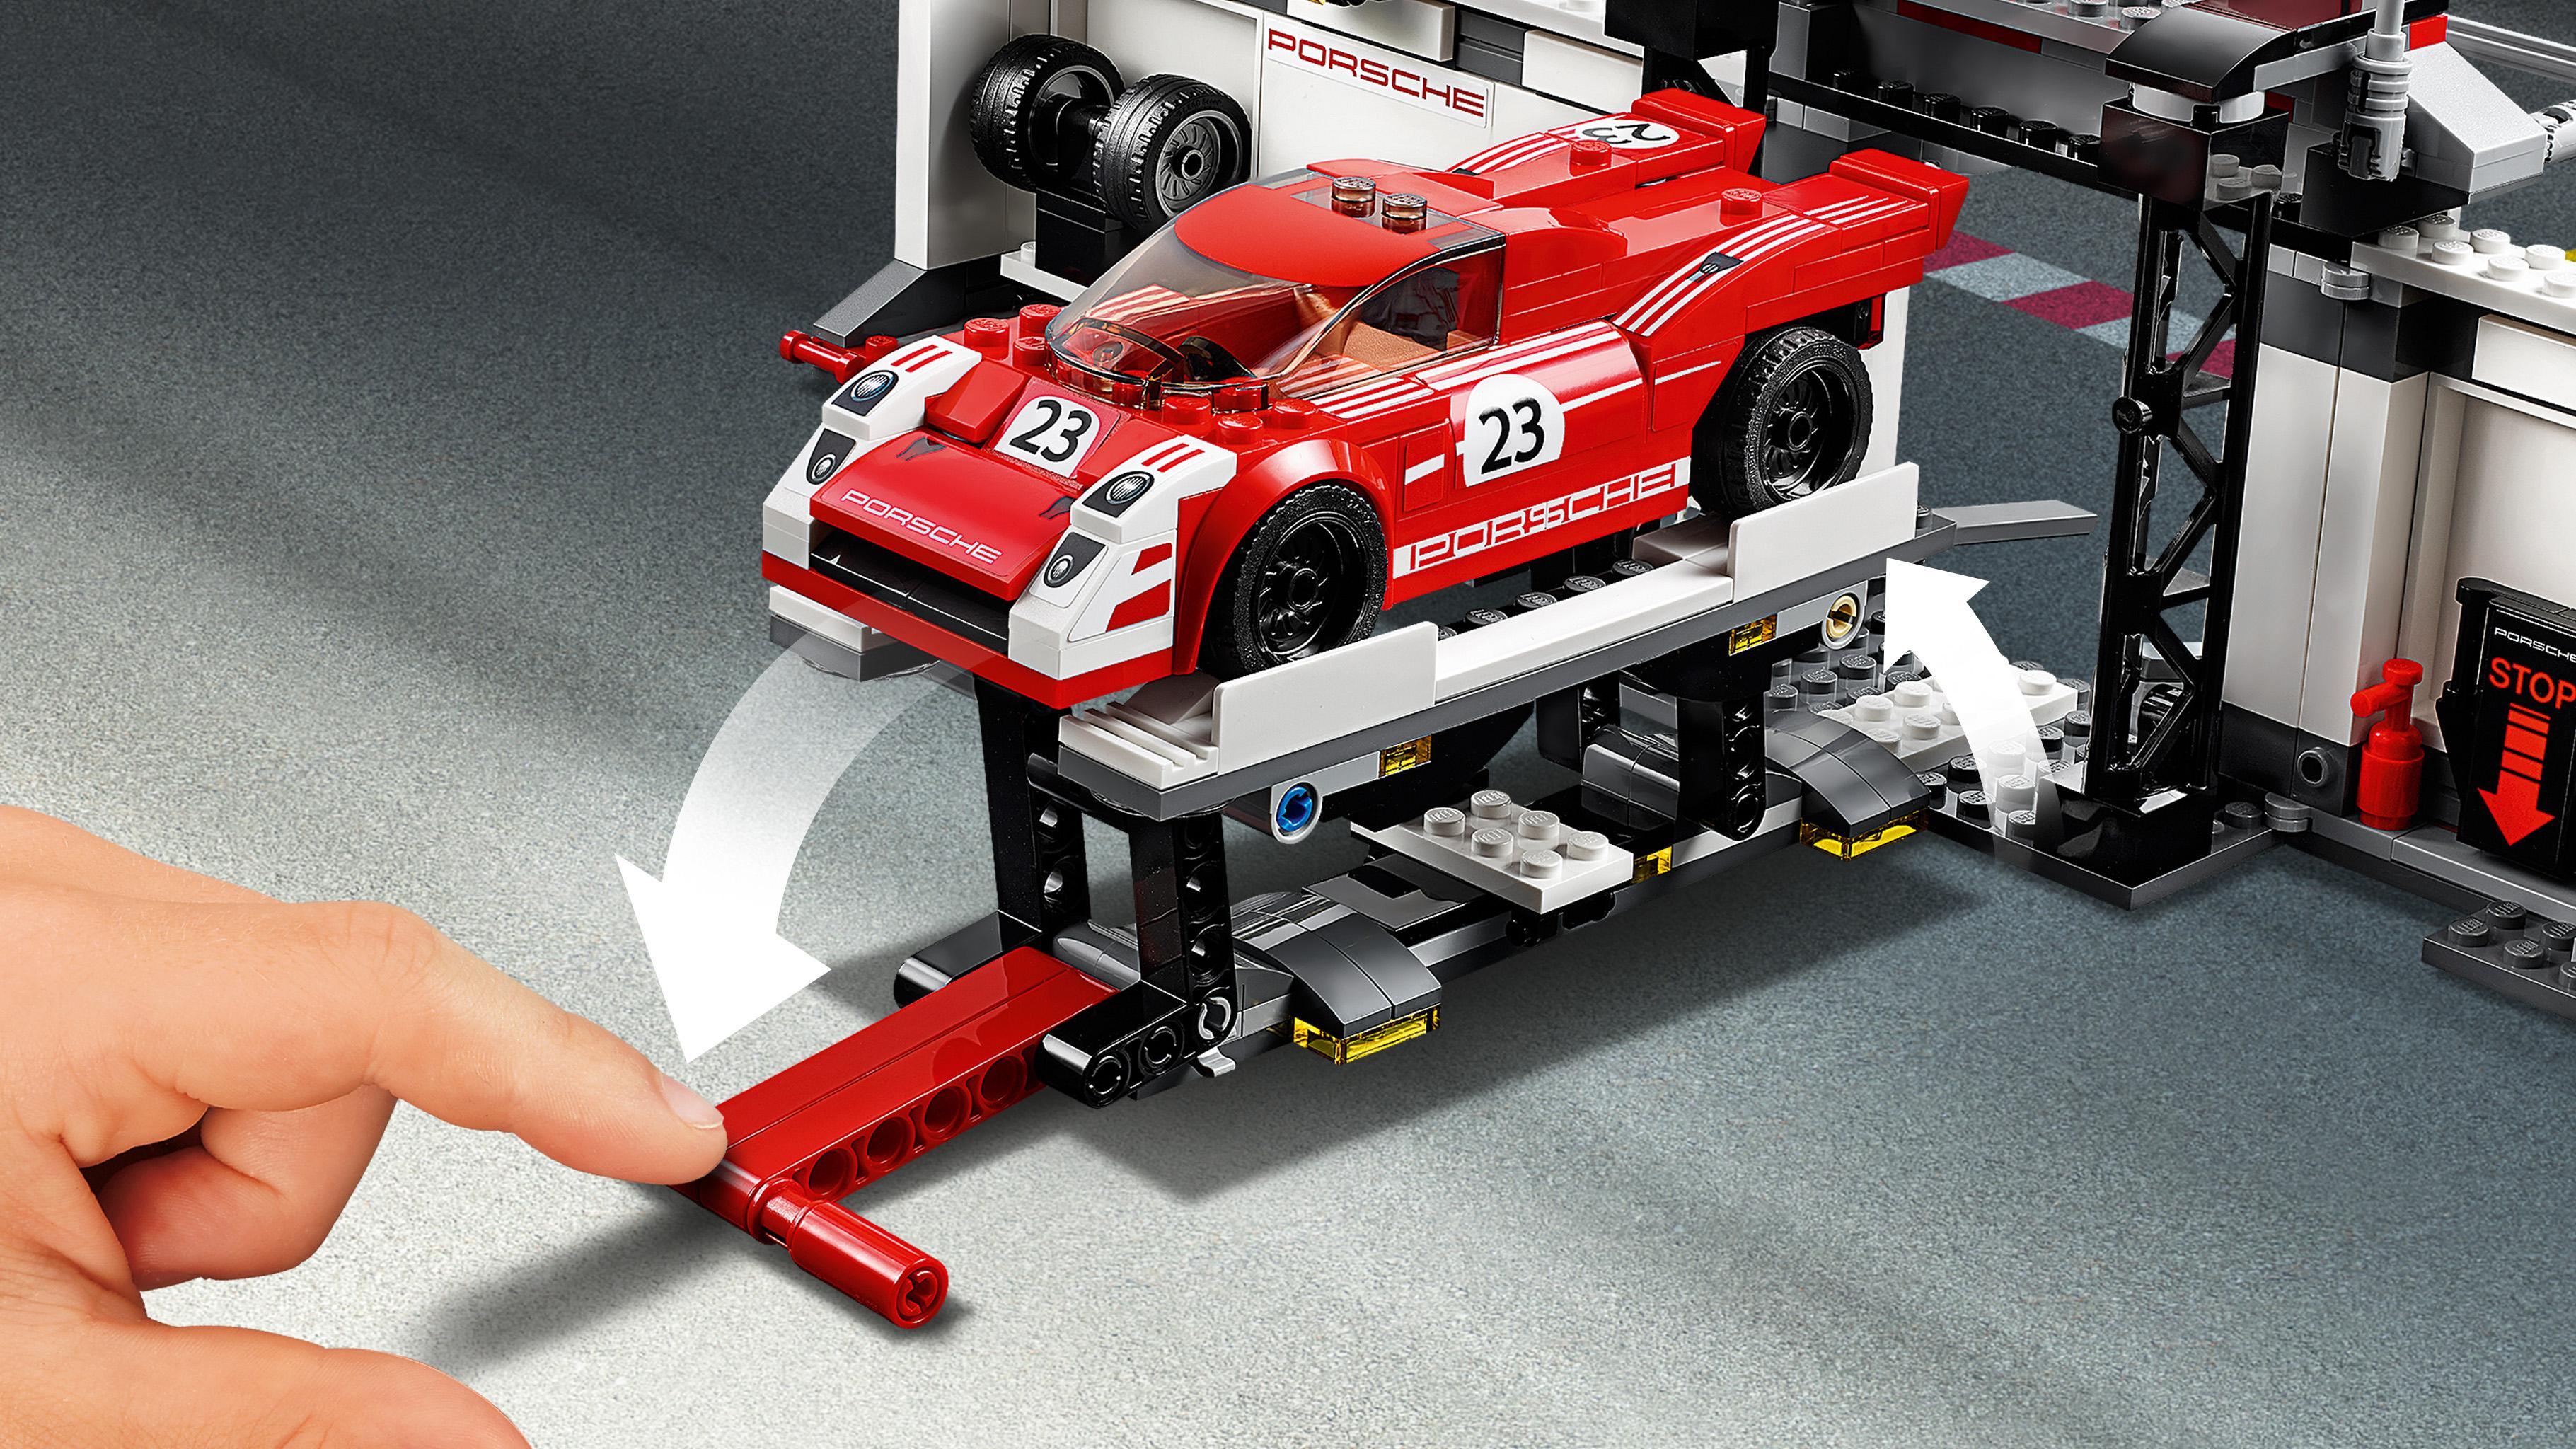 458978b2-6d6c-4fa4-9532-571a34b56599.jpg._CB296092132_ Remarkable 75912 Porsche 911 Gt Ziellinie Cars Trend